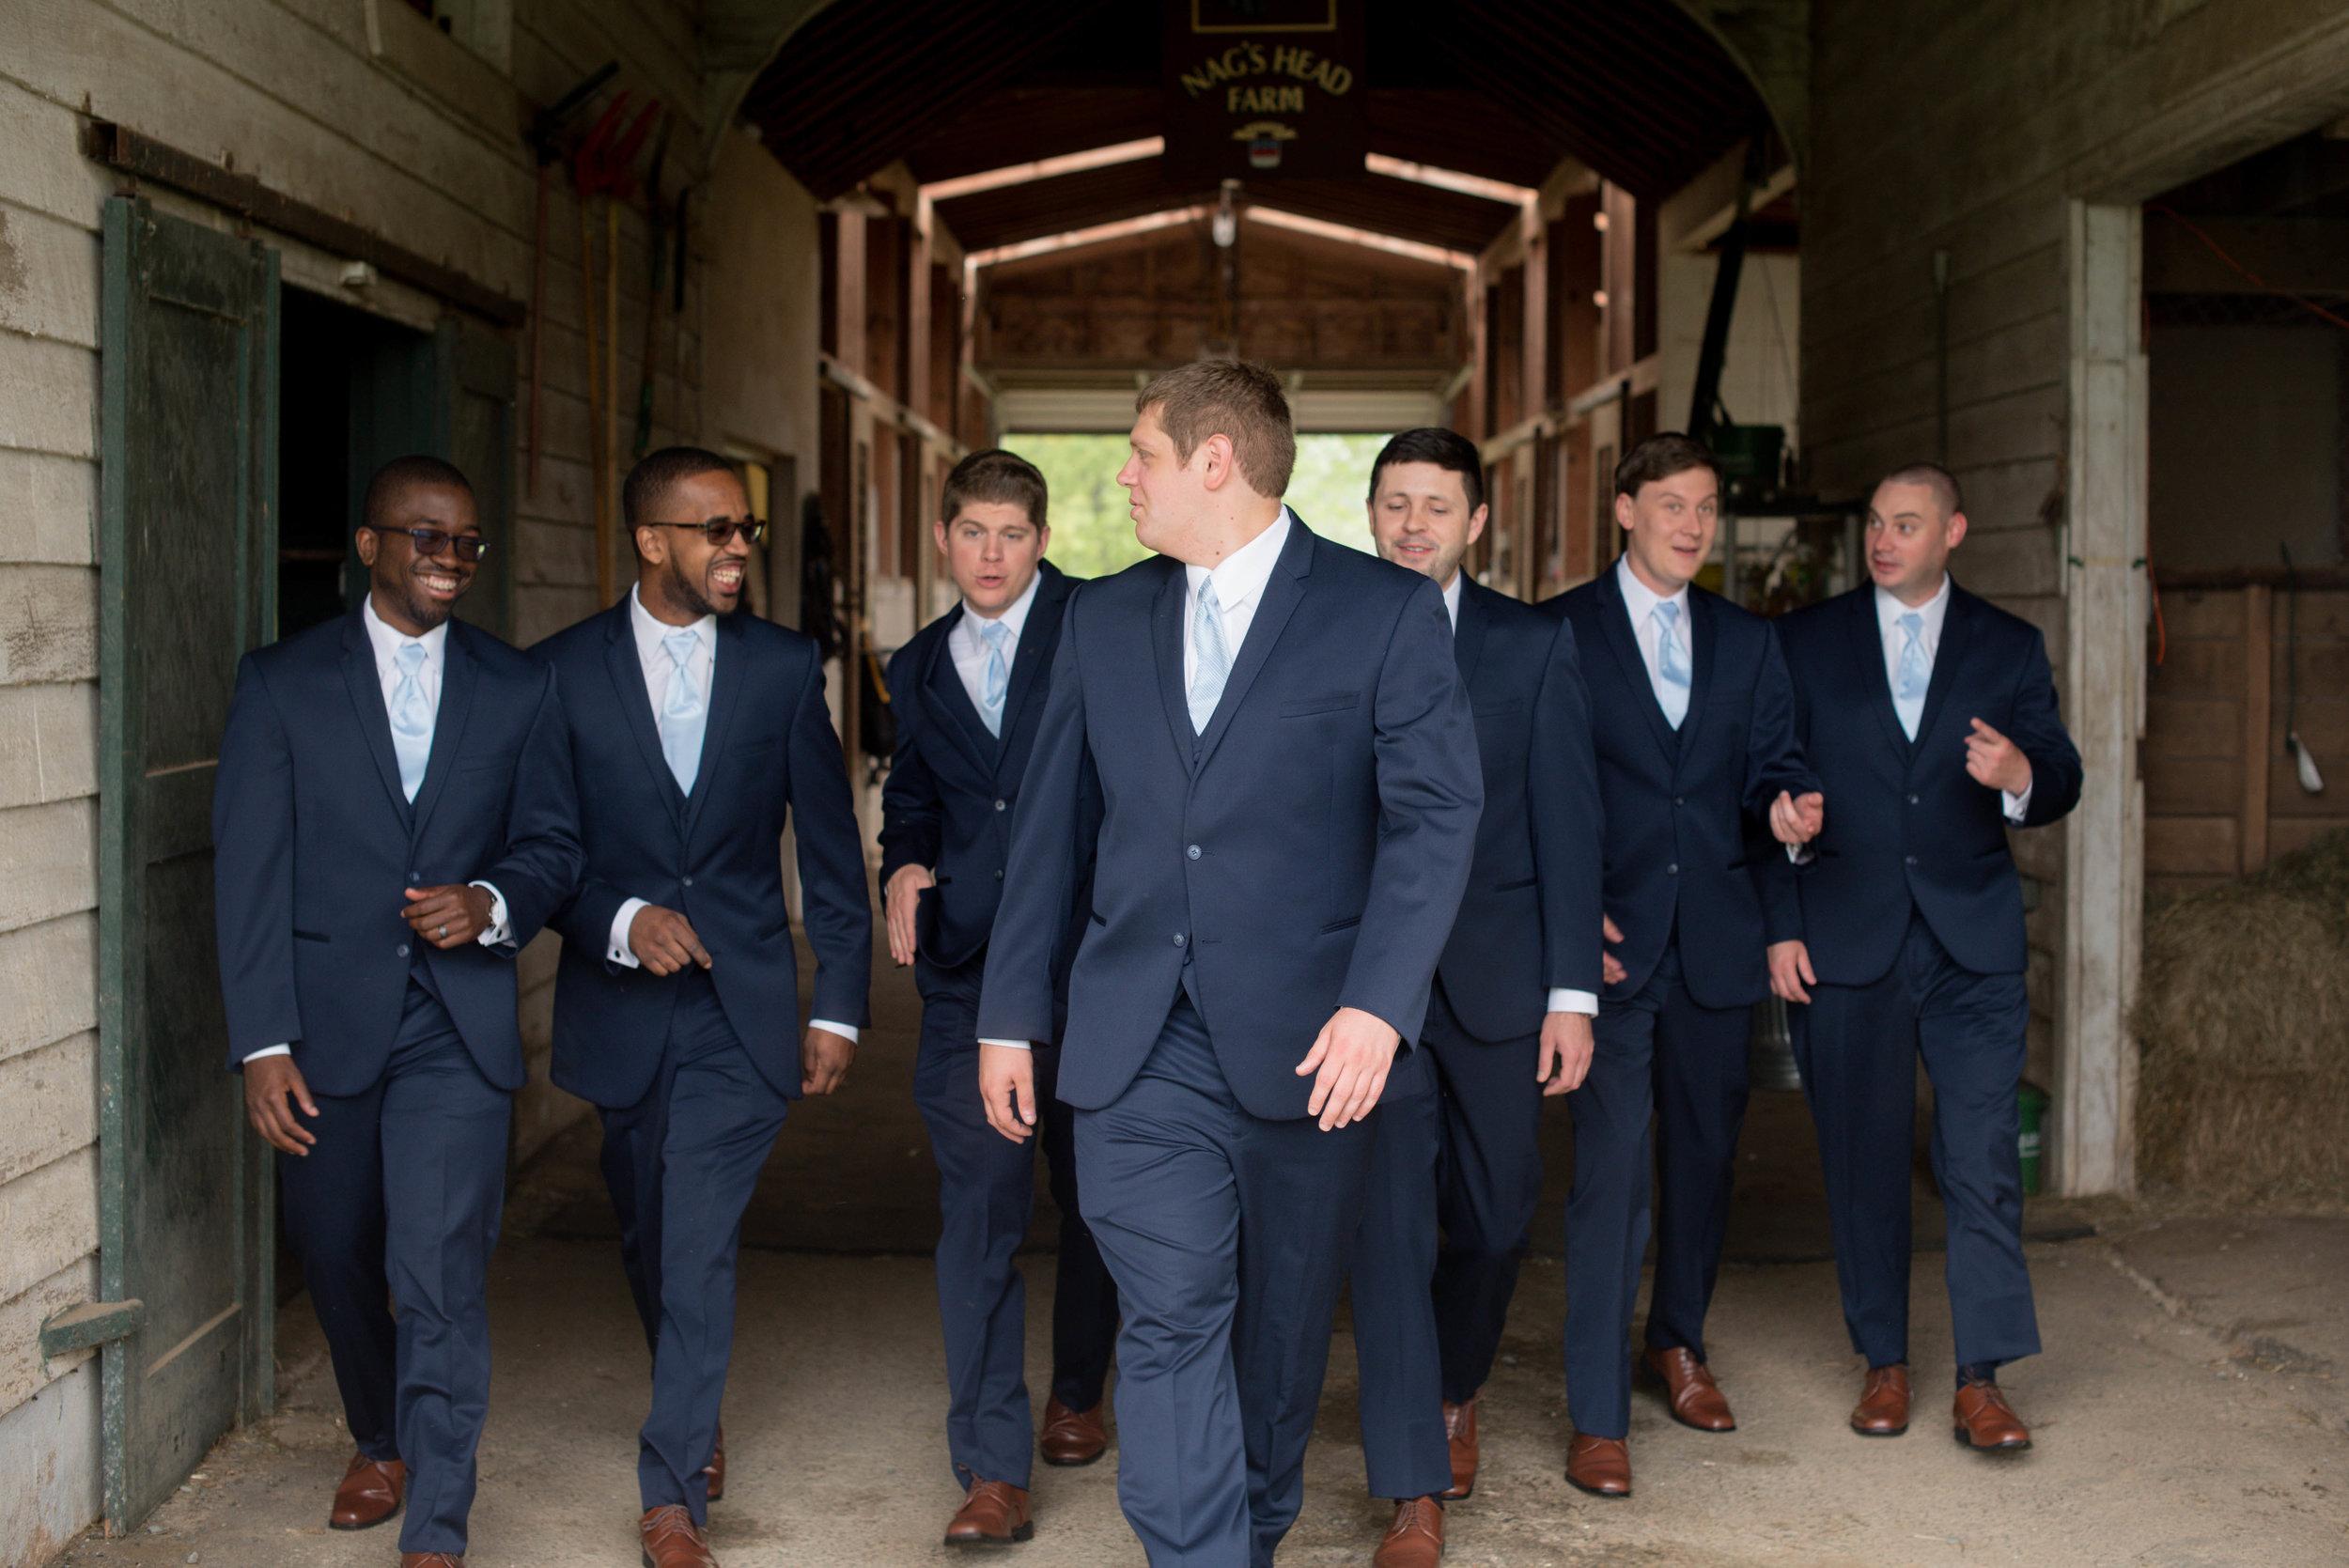 blue-ridge-wedding-ashley-nicole-photography-restoration-hall-crozetphotography-restorationhall-charlottesville-wedding_BPgroomsmen-5.jpg